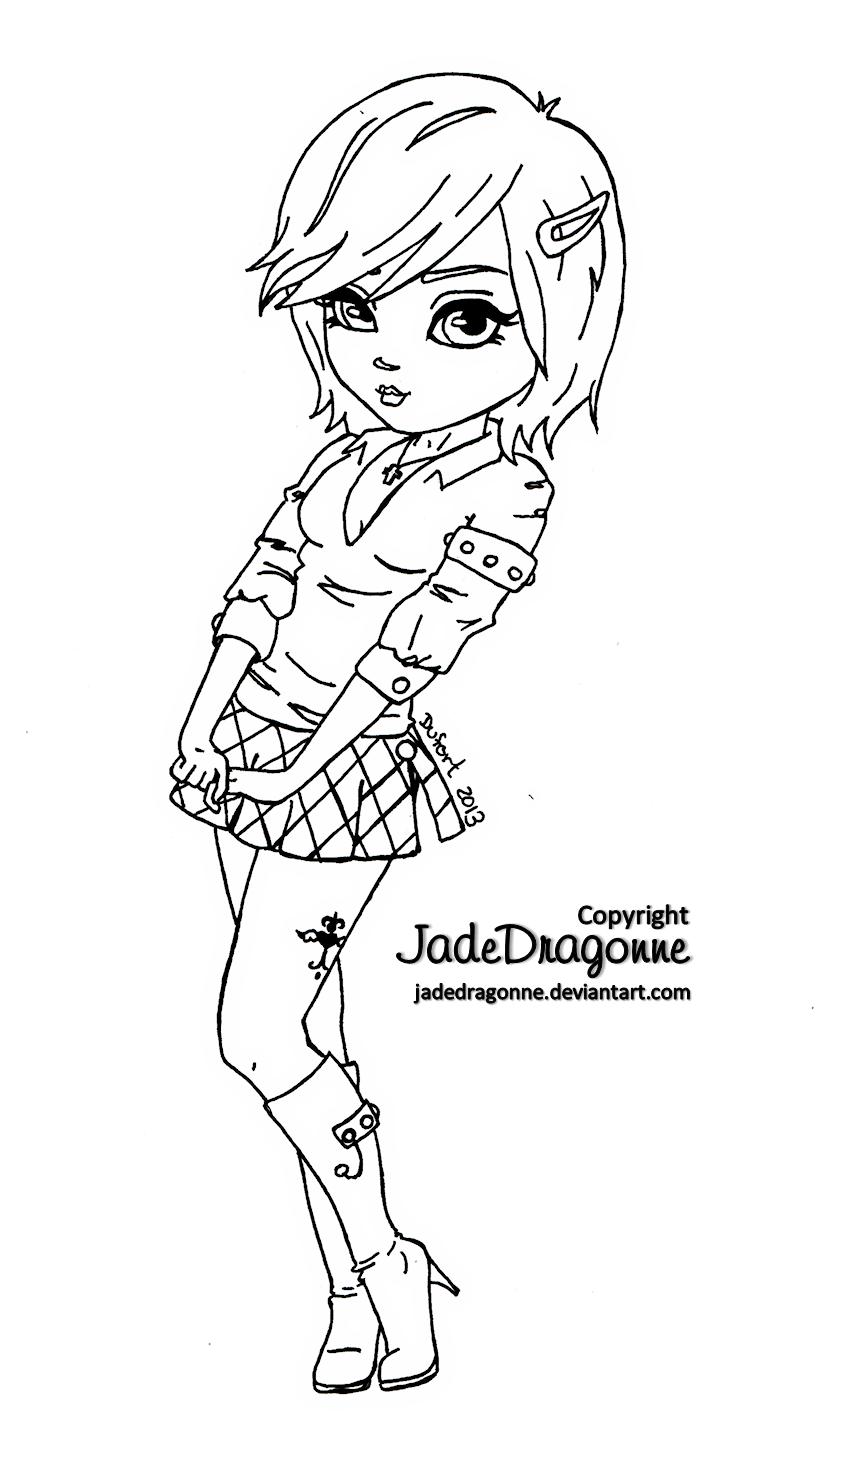 Skirt \'n boots - Lineart by JadeDragonne.deviantart.com on ...